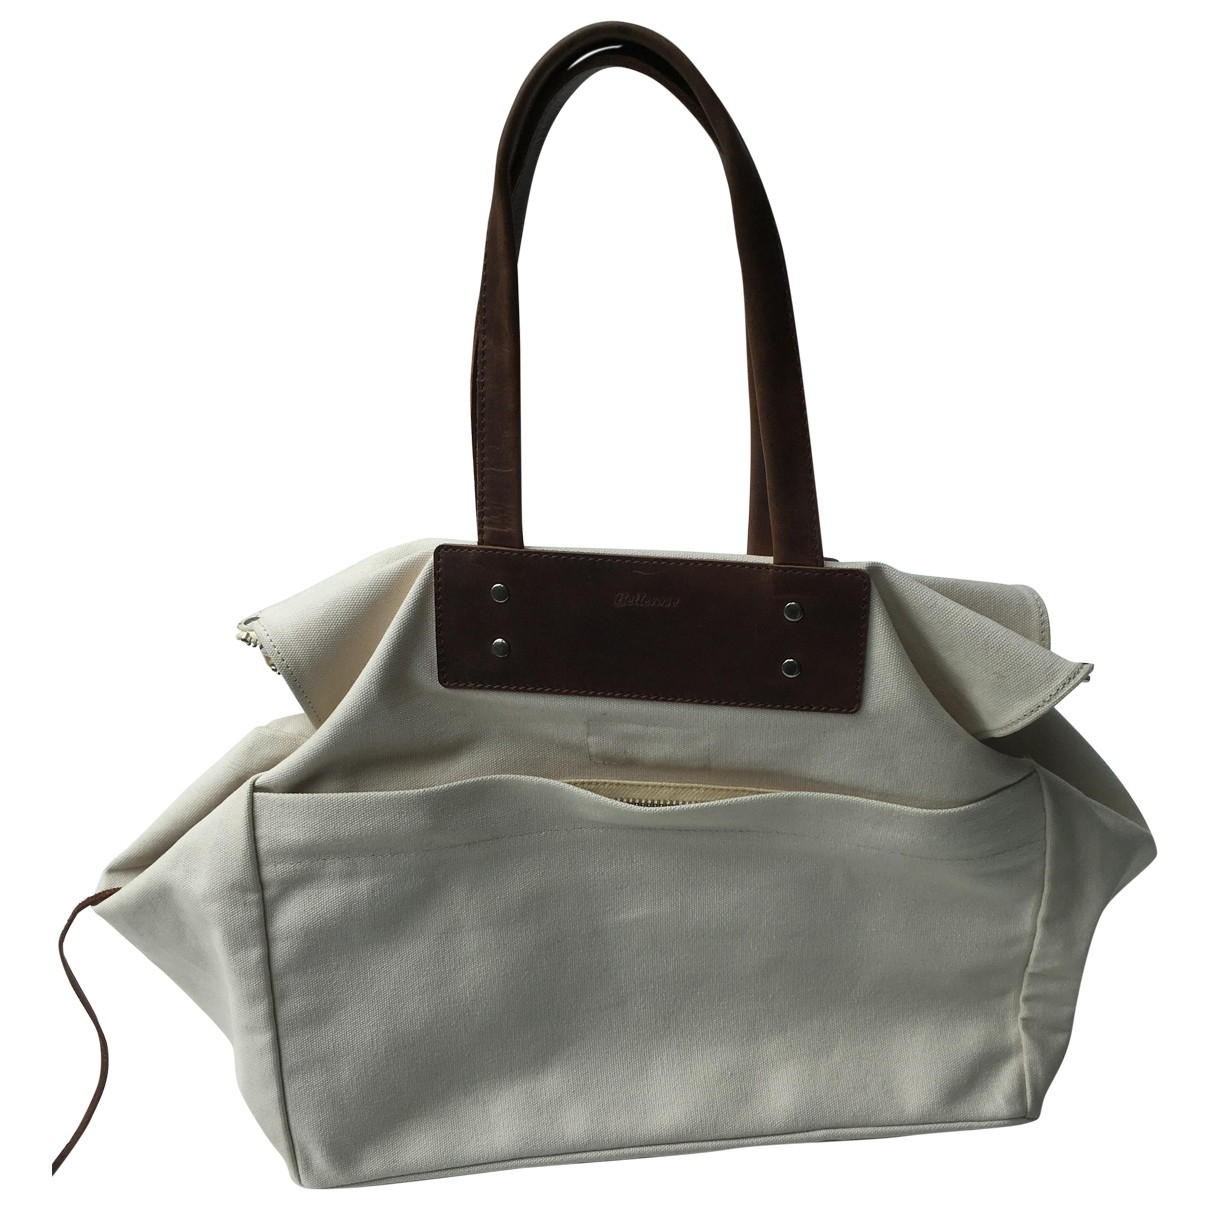 Bellerose \N Ecru Cotton handbag for Women \N